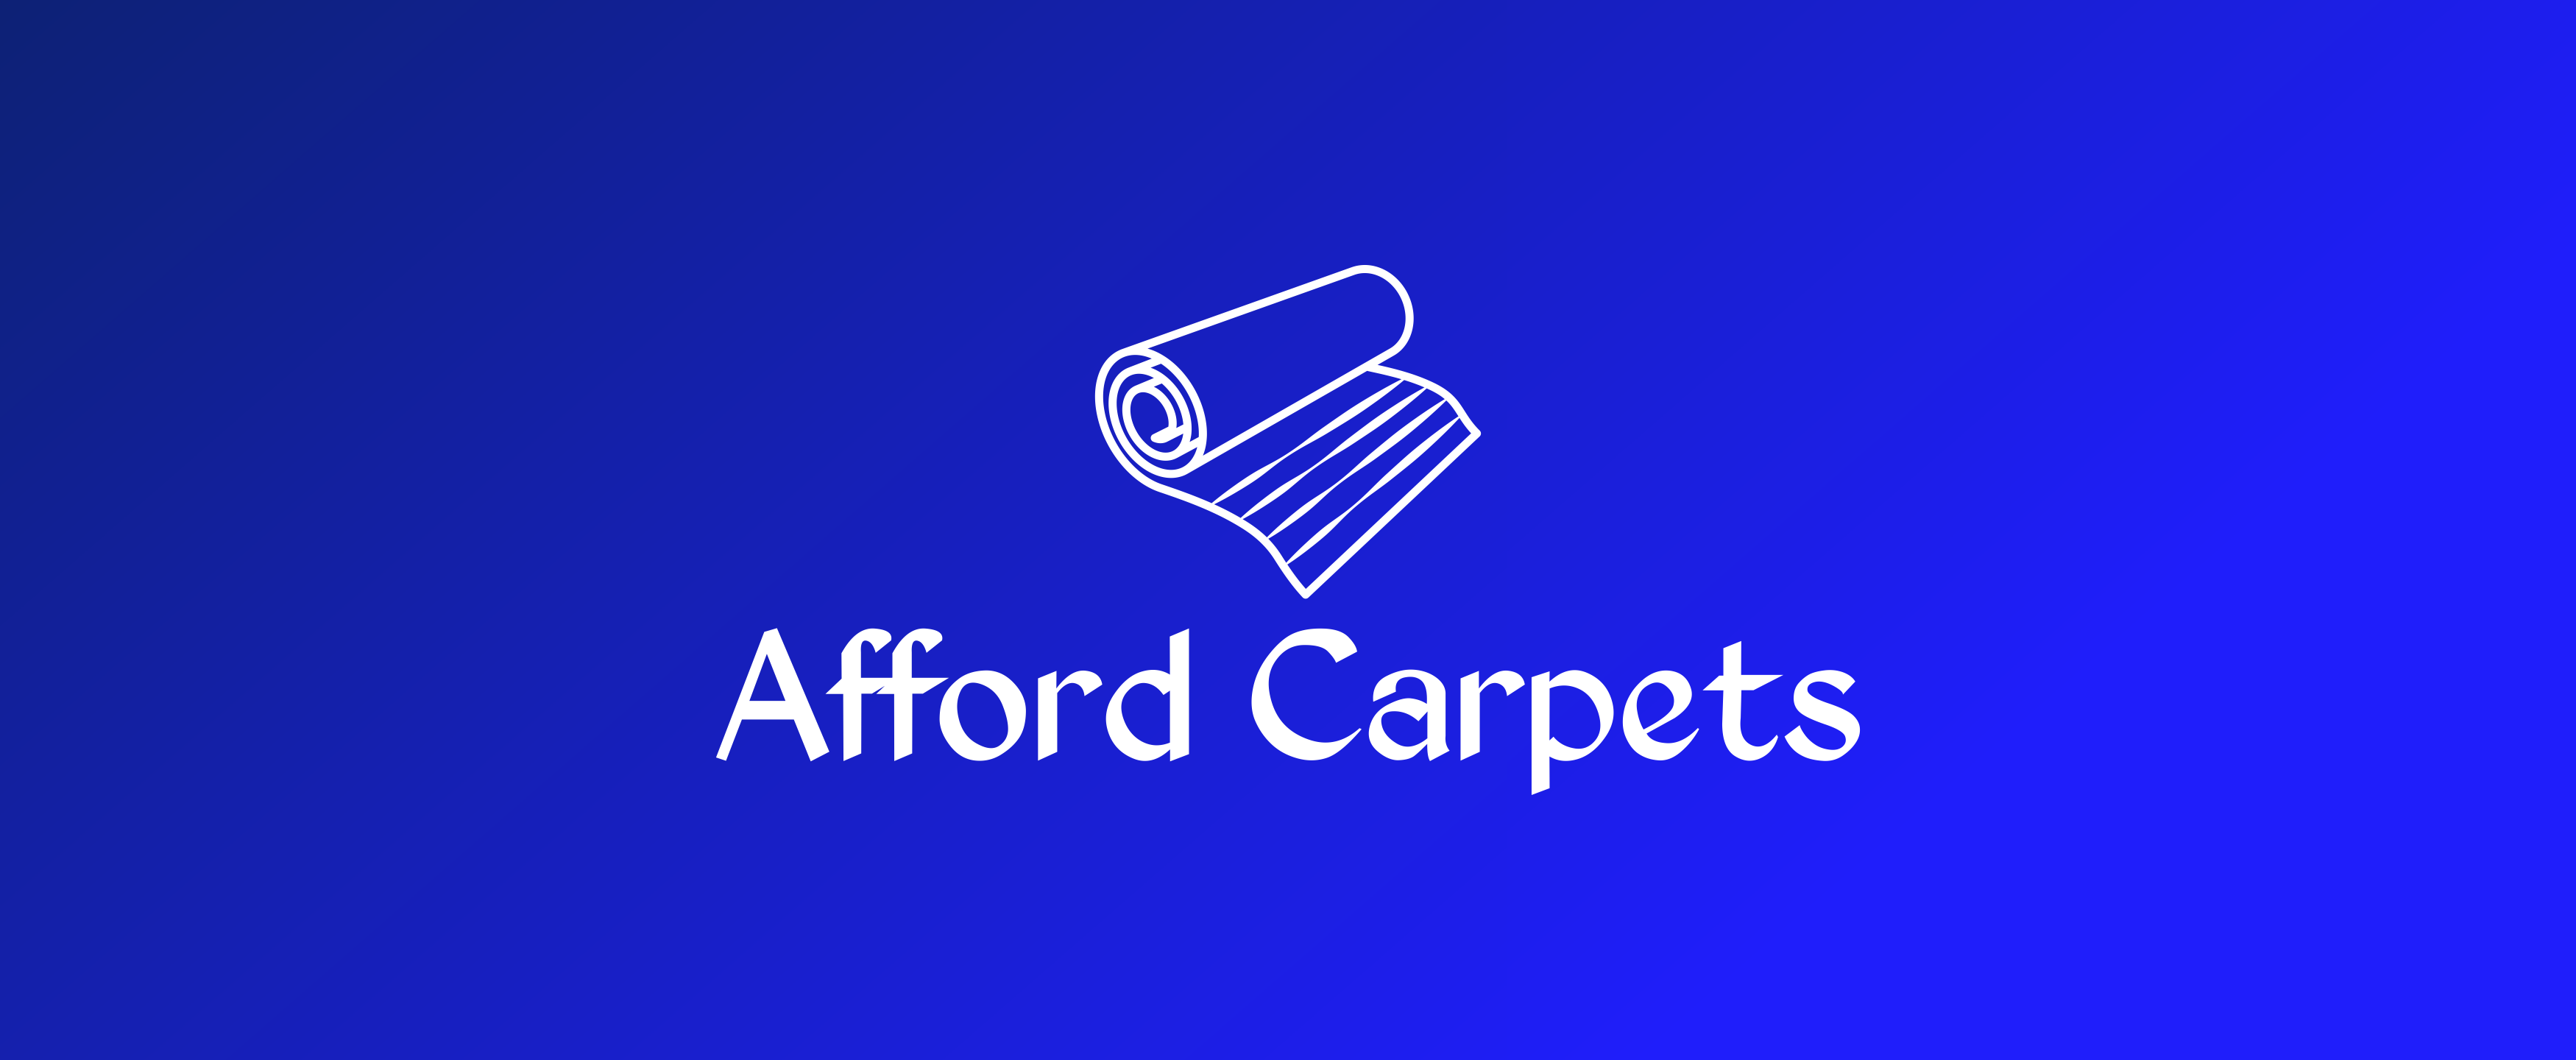 Afford Carpets